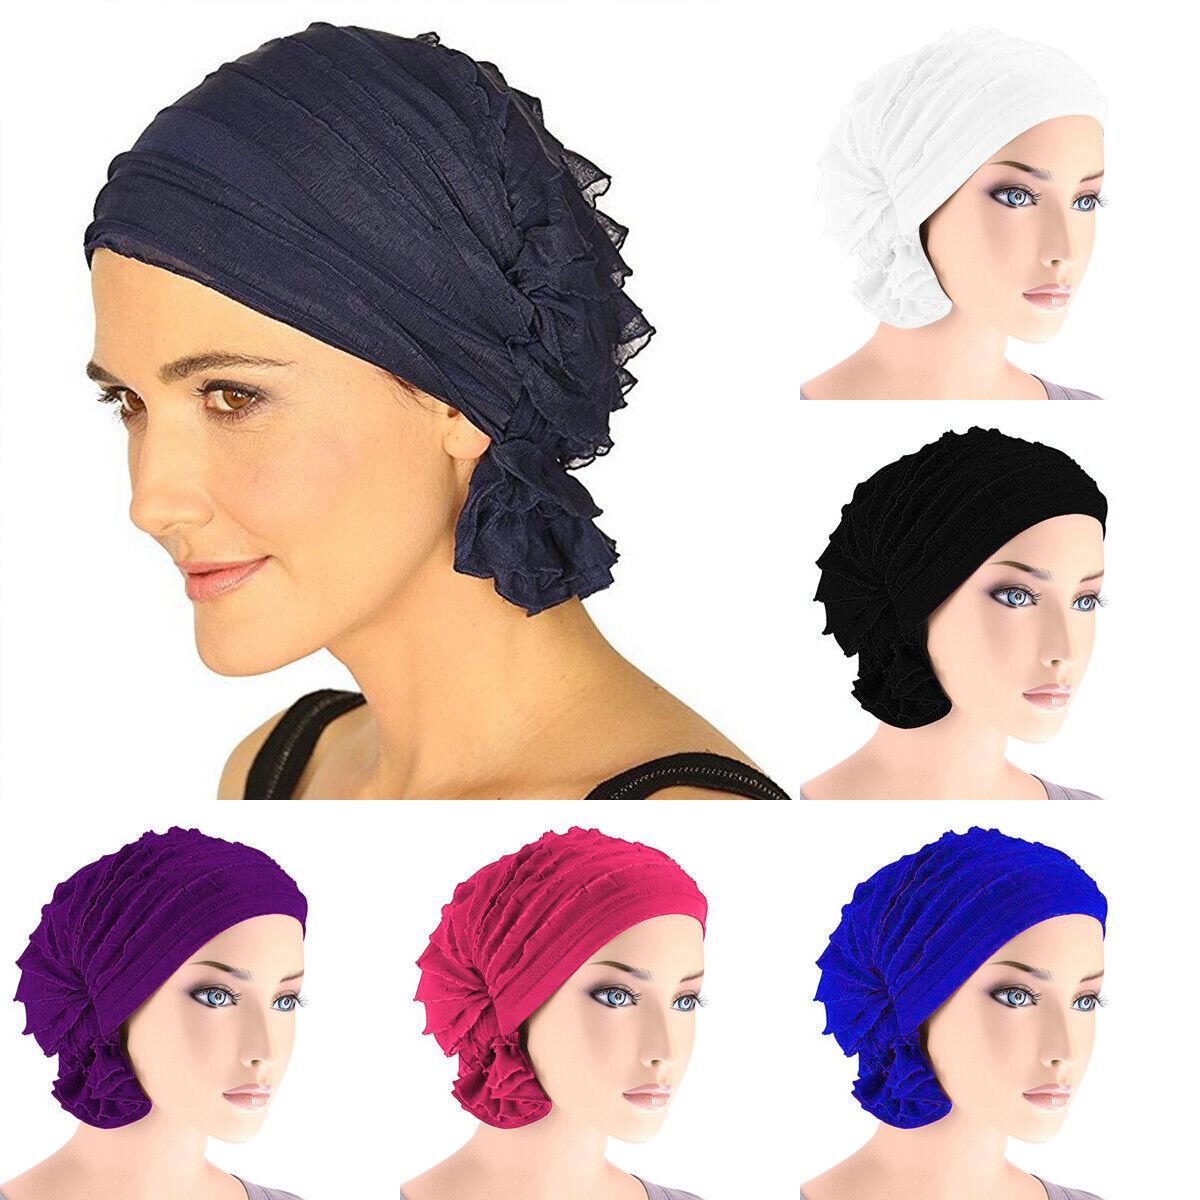 Women Hair Chiffon Headwear Turban Cap Flower Muslim Chemo H